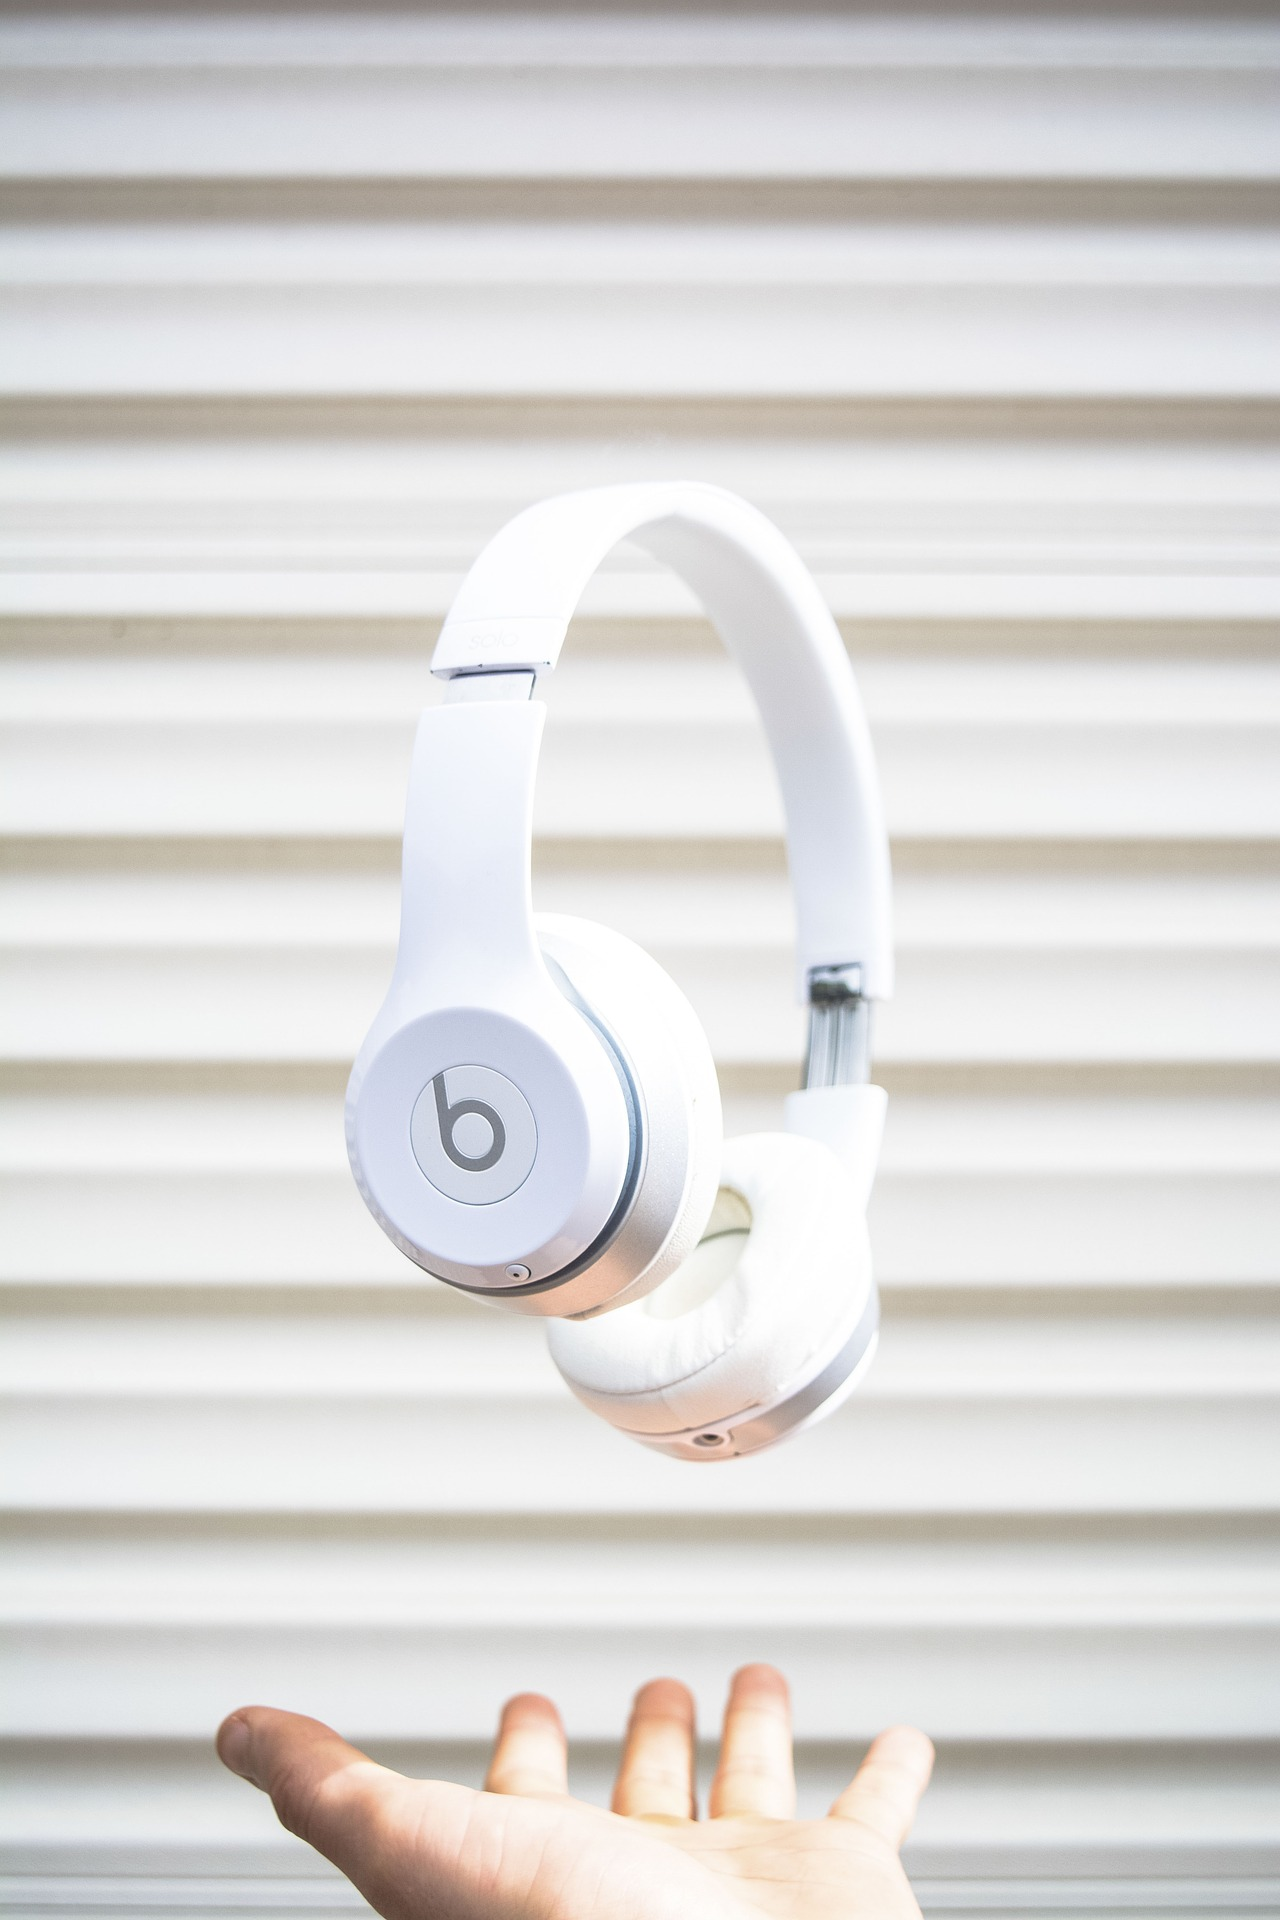 beats-solo-3-wireless-headphones-review